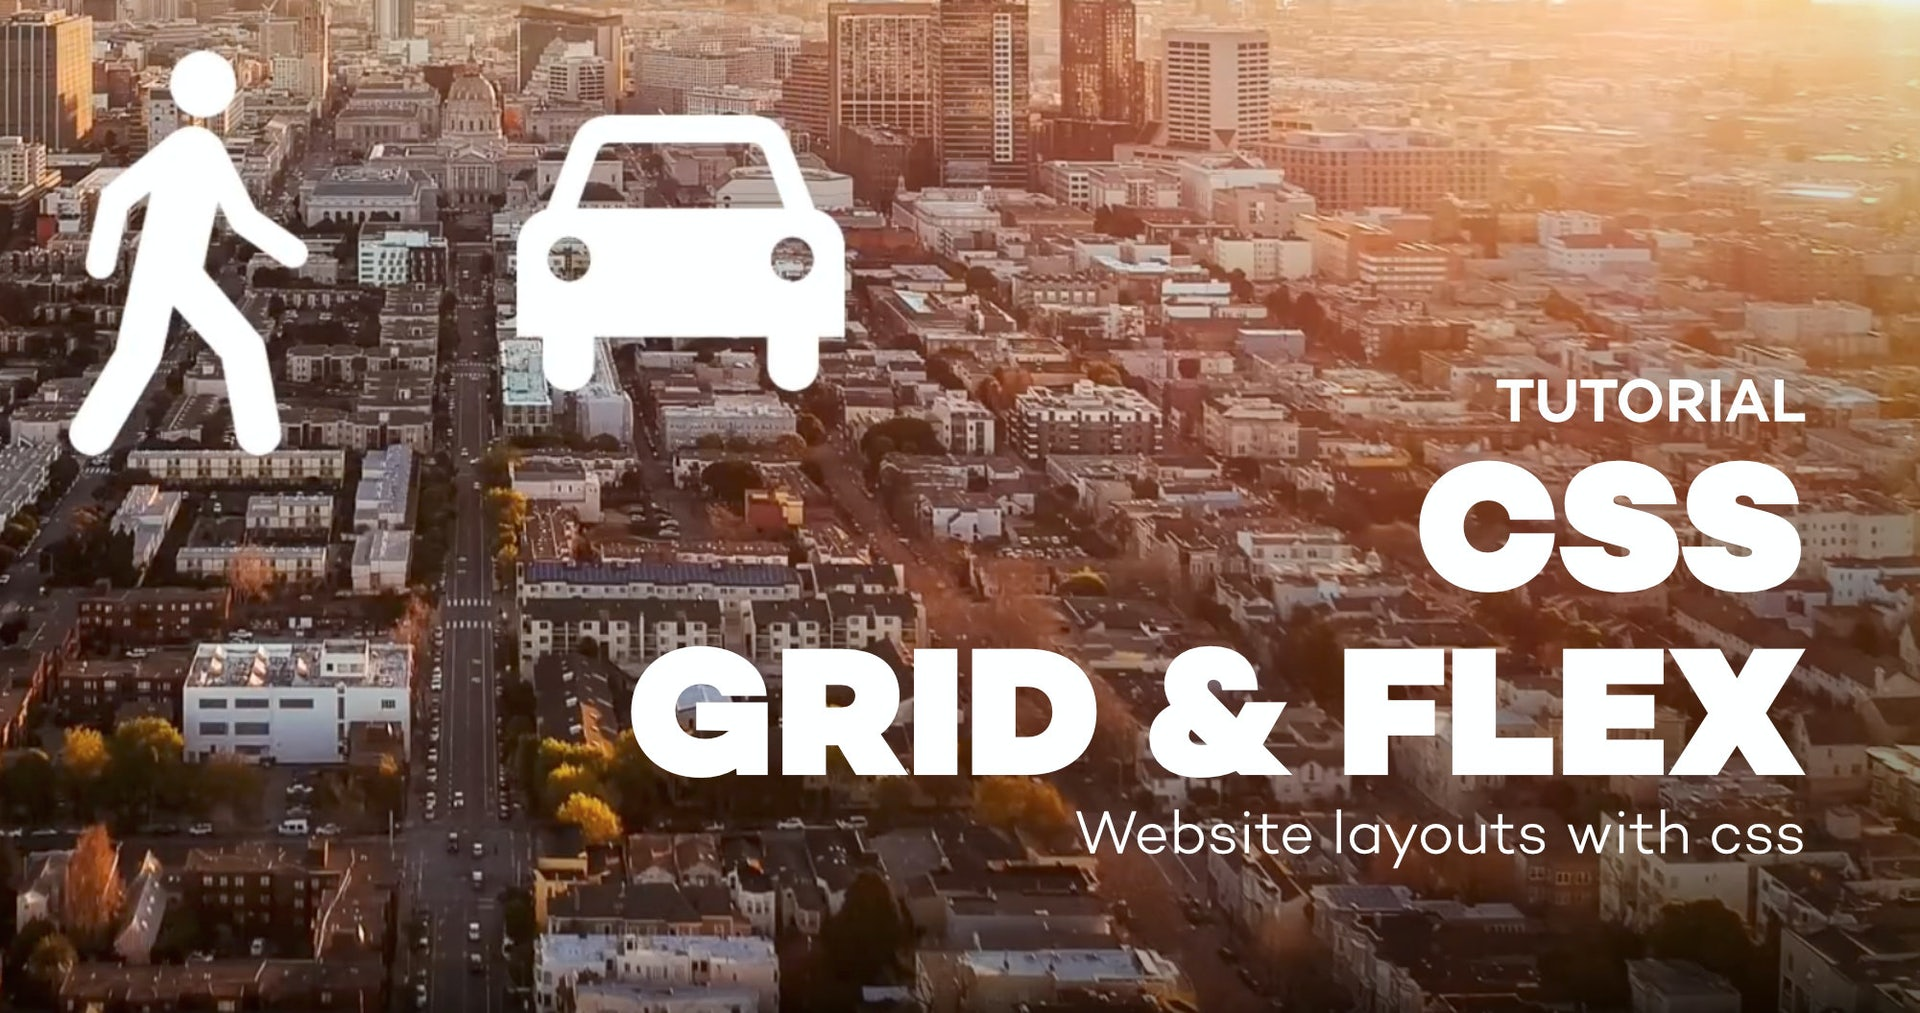 Tutorial: CSS Grid & Flex